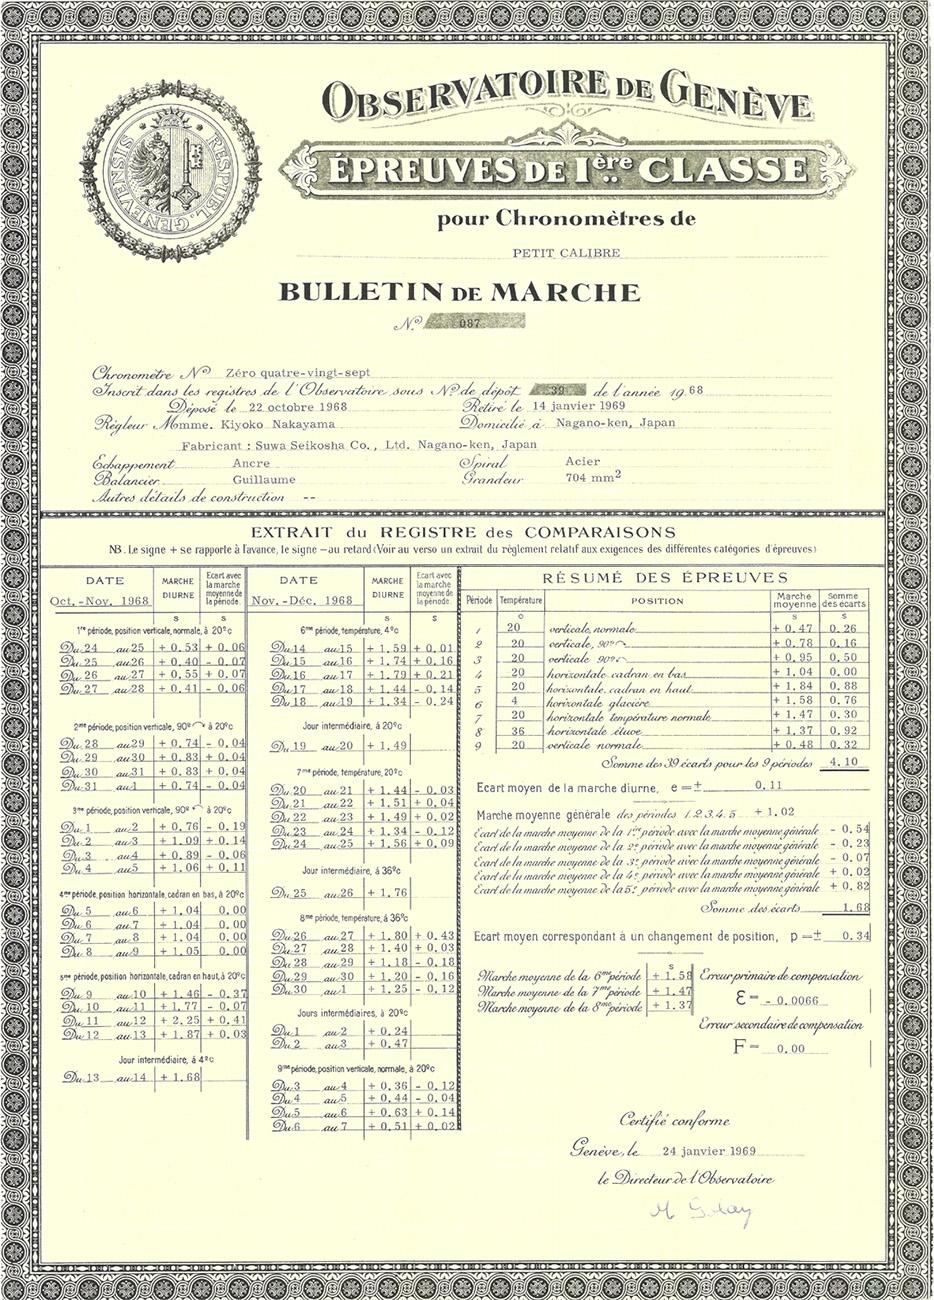 Geneva Observatory Certificate